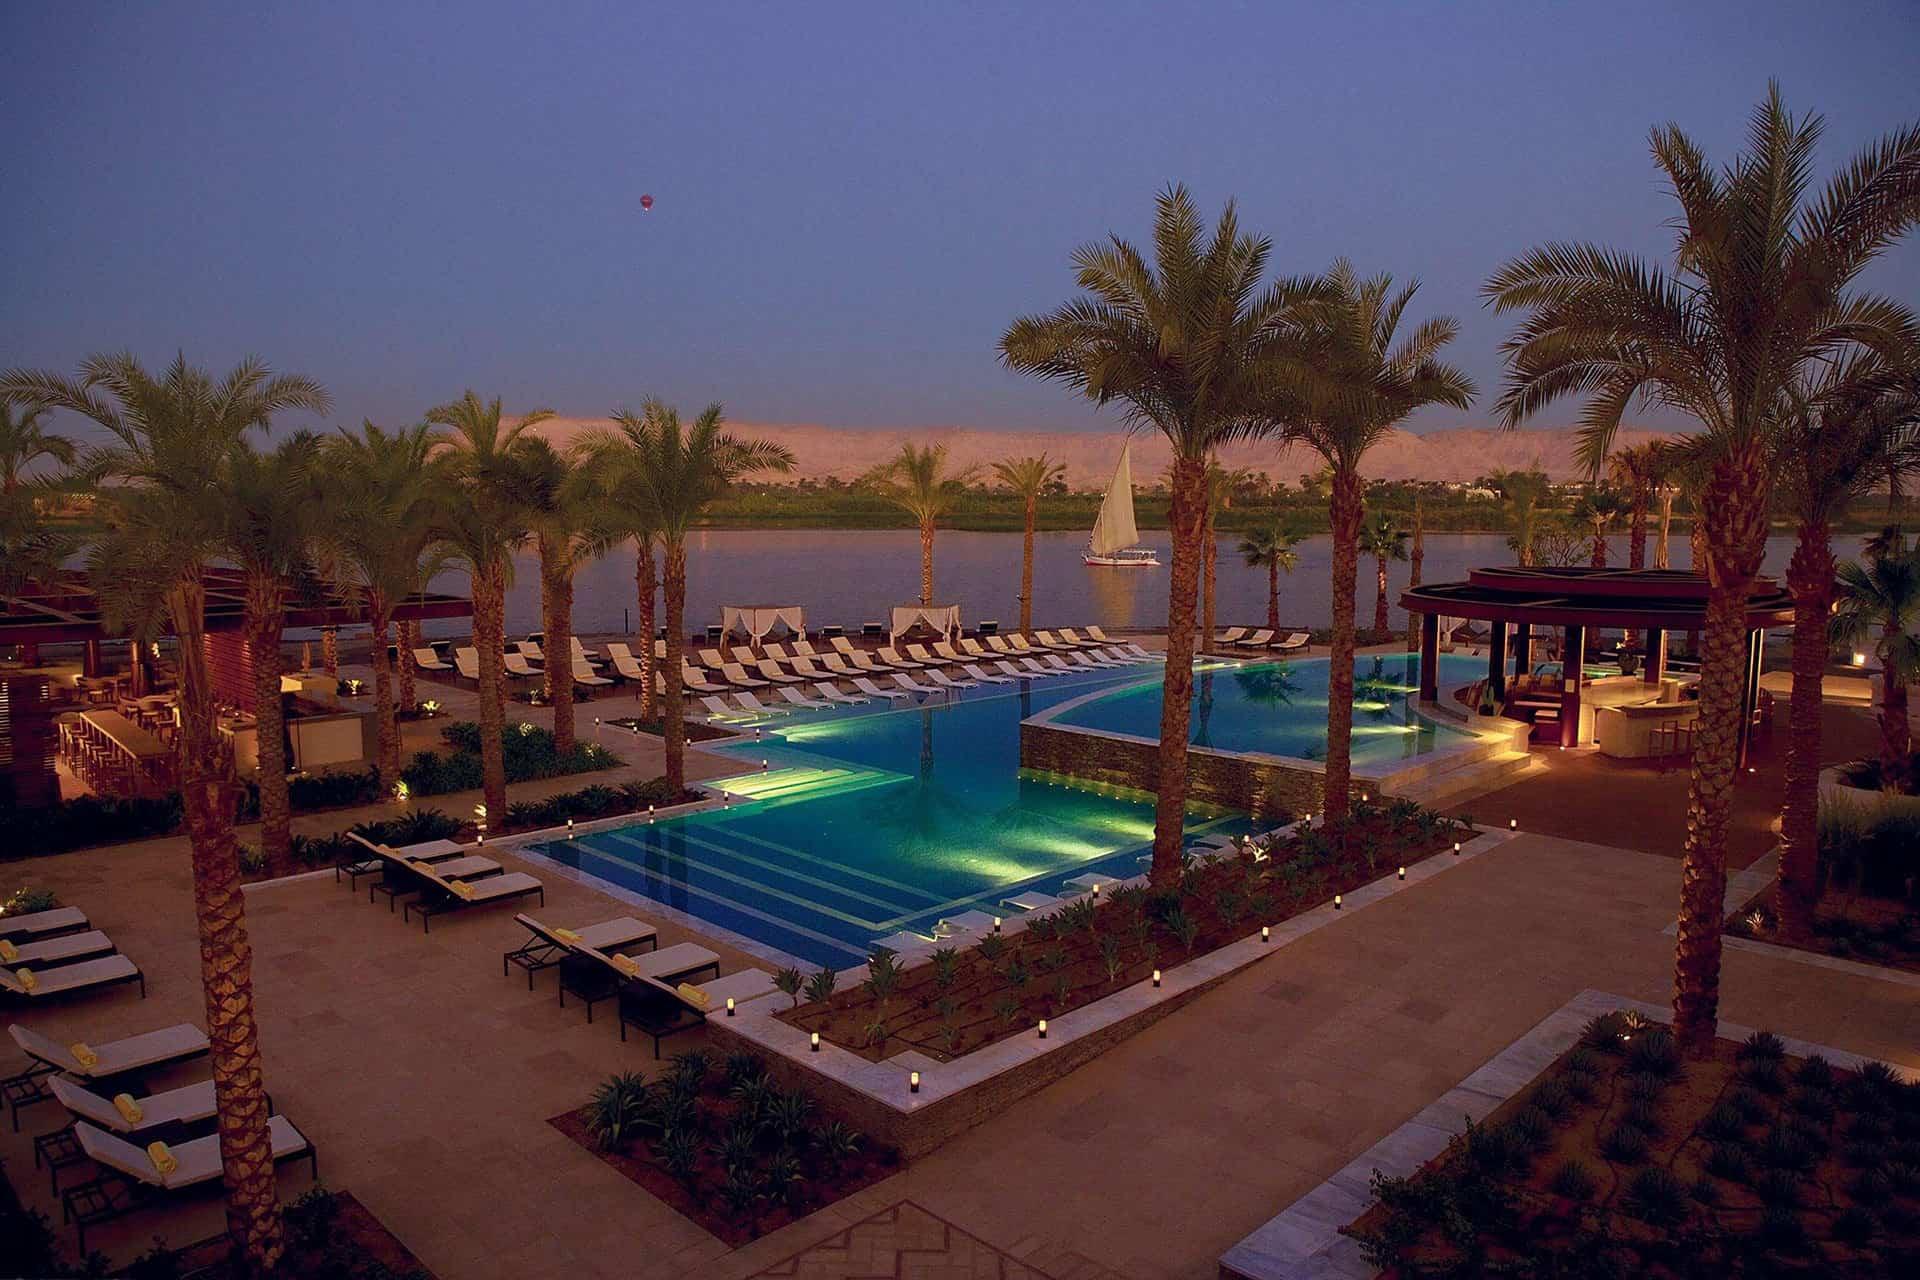 Hilton Resort in Luxor